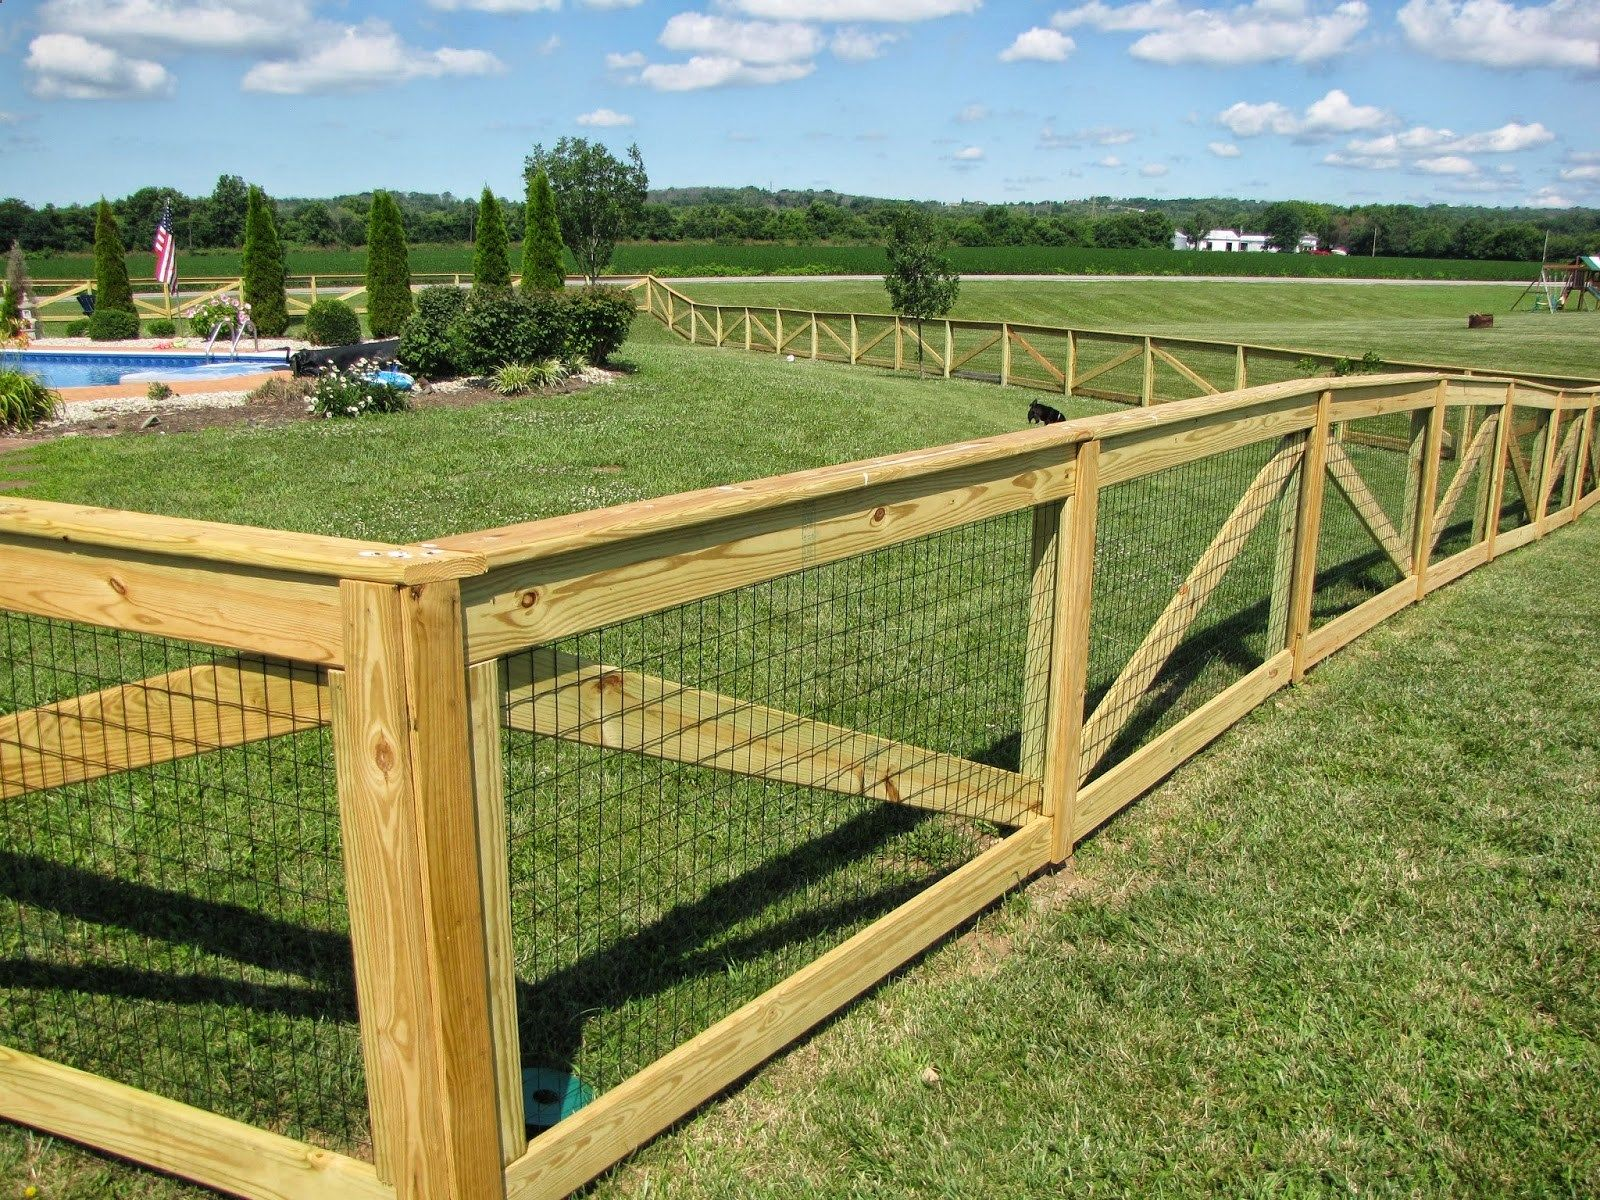 New Diy Dog Fence DIY Dog Fence in the Yard – Design and ideas